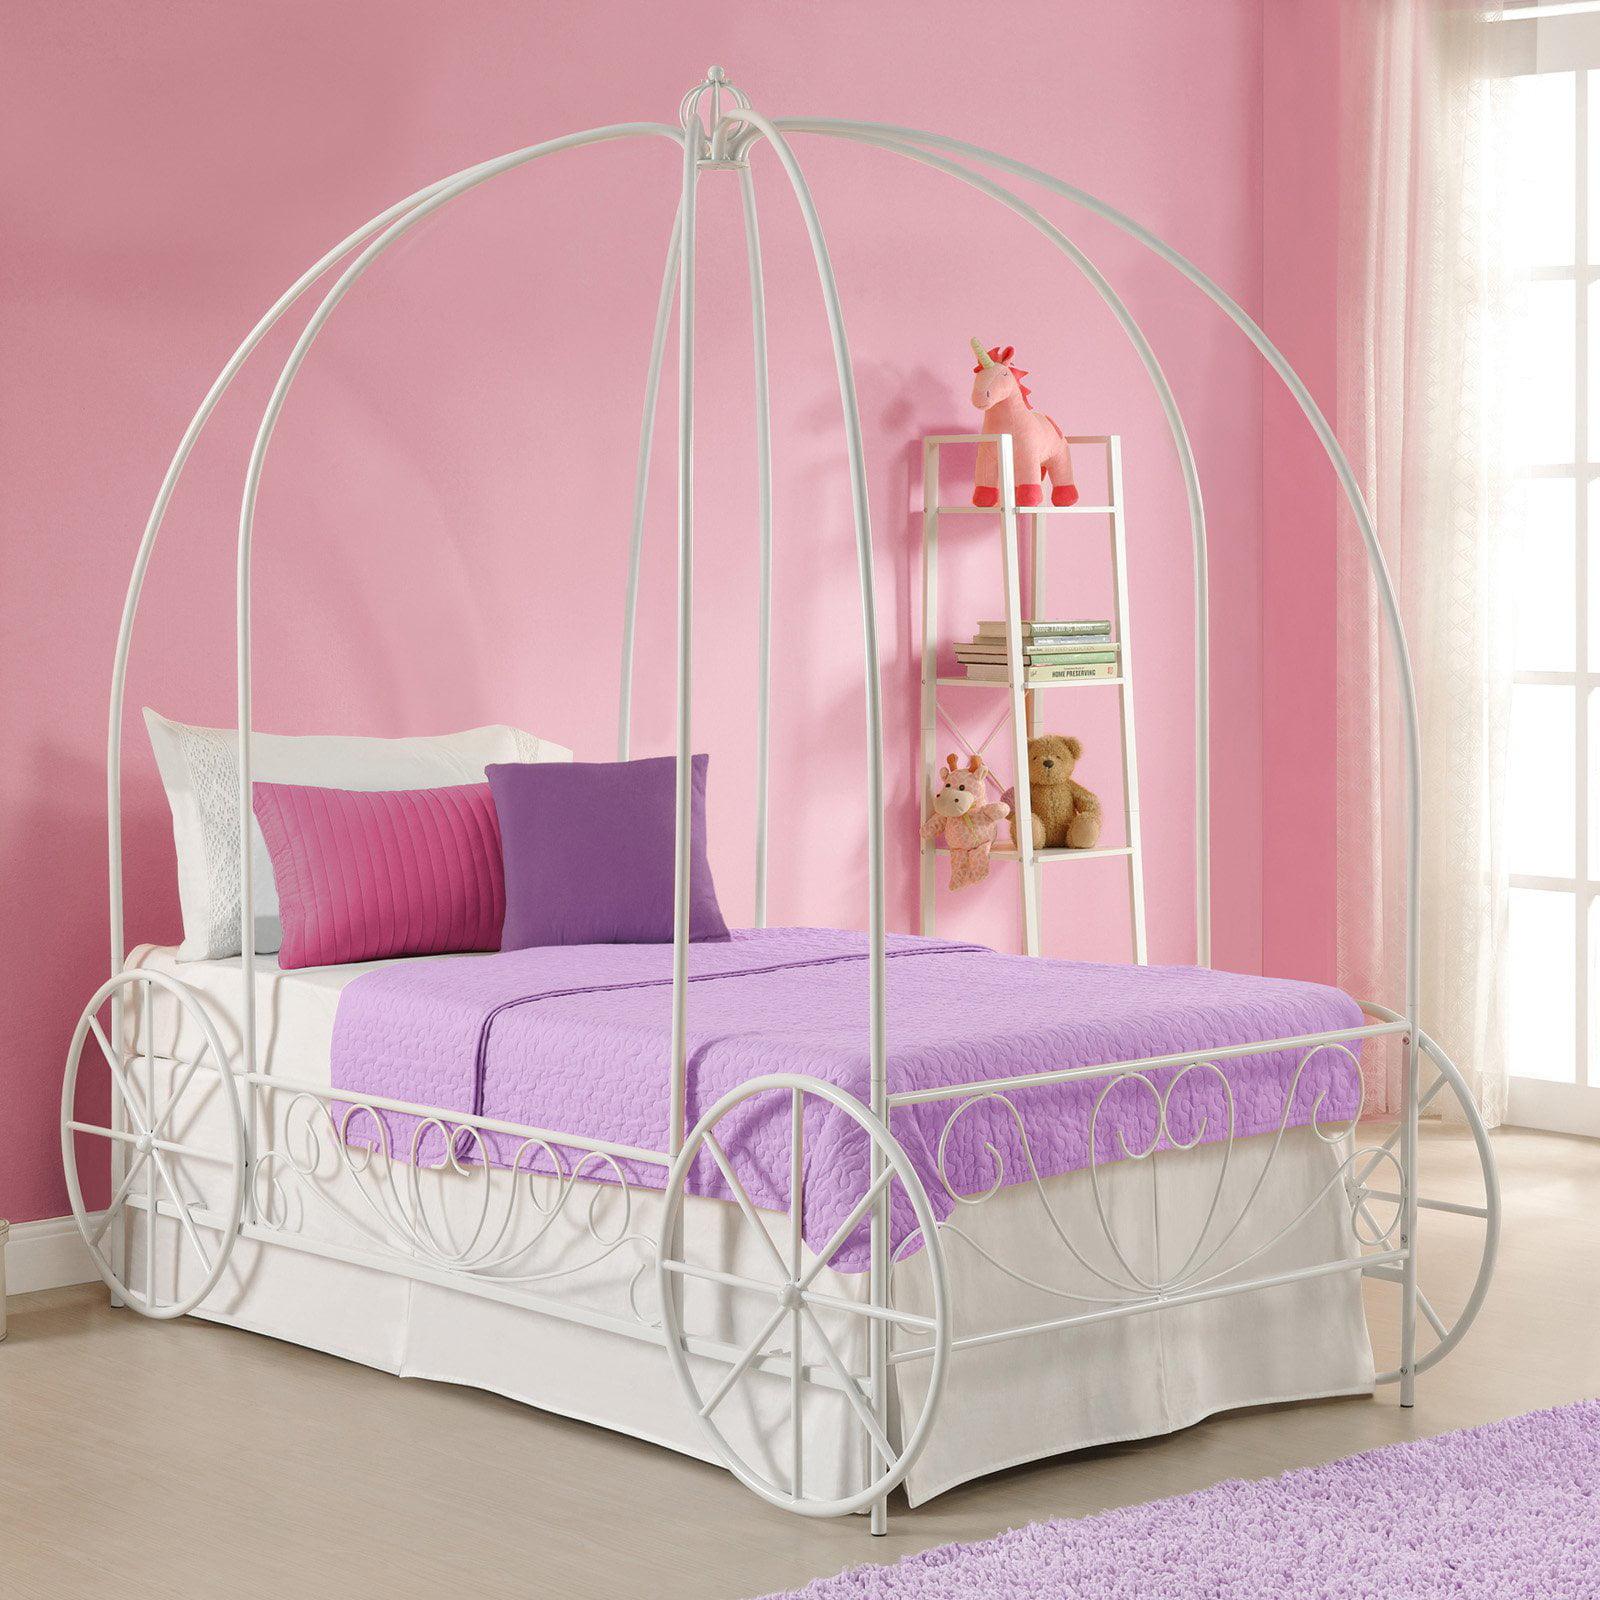 & Dorel DHP Metal Twin Carriage Bed Multiple Colors - Walmart.com